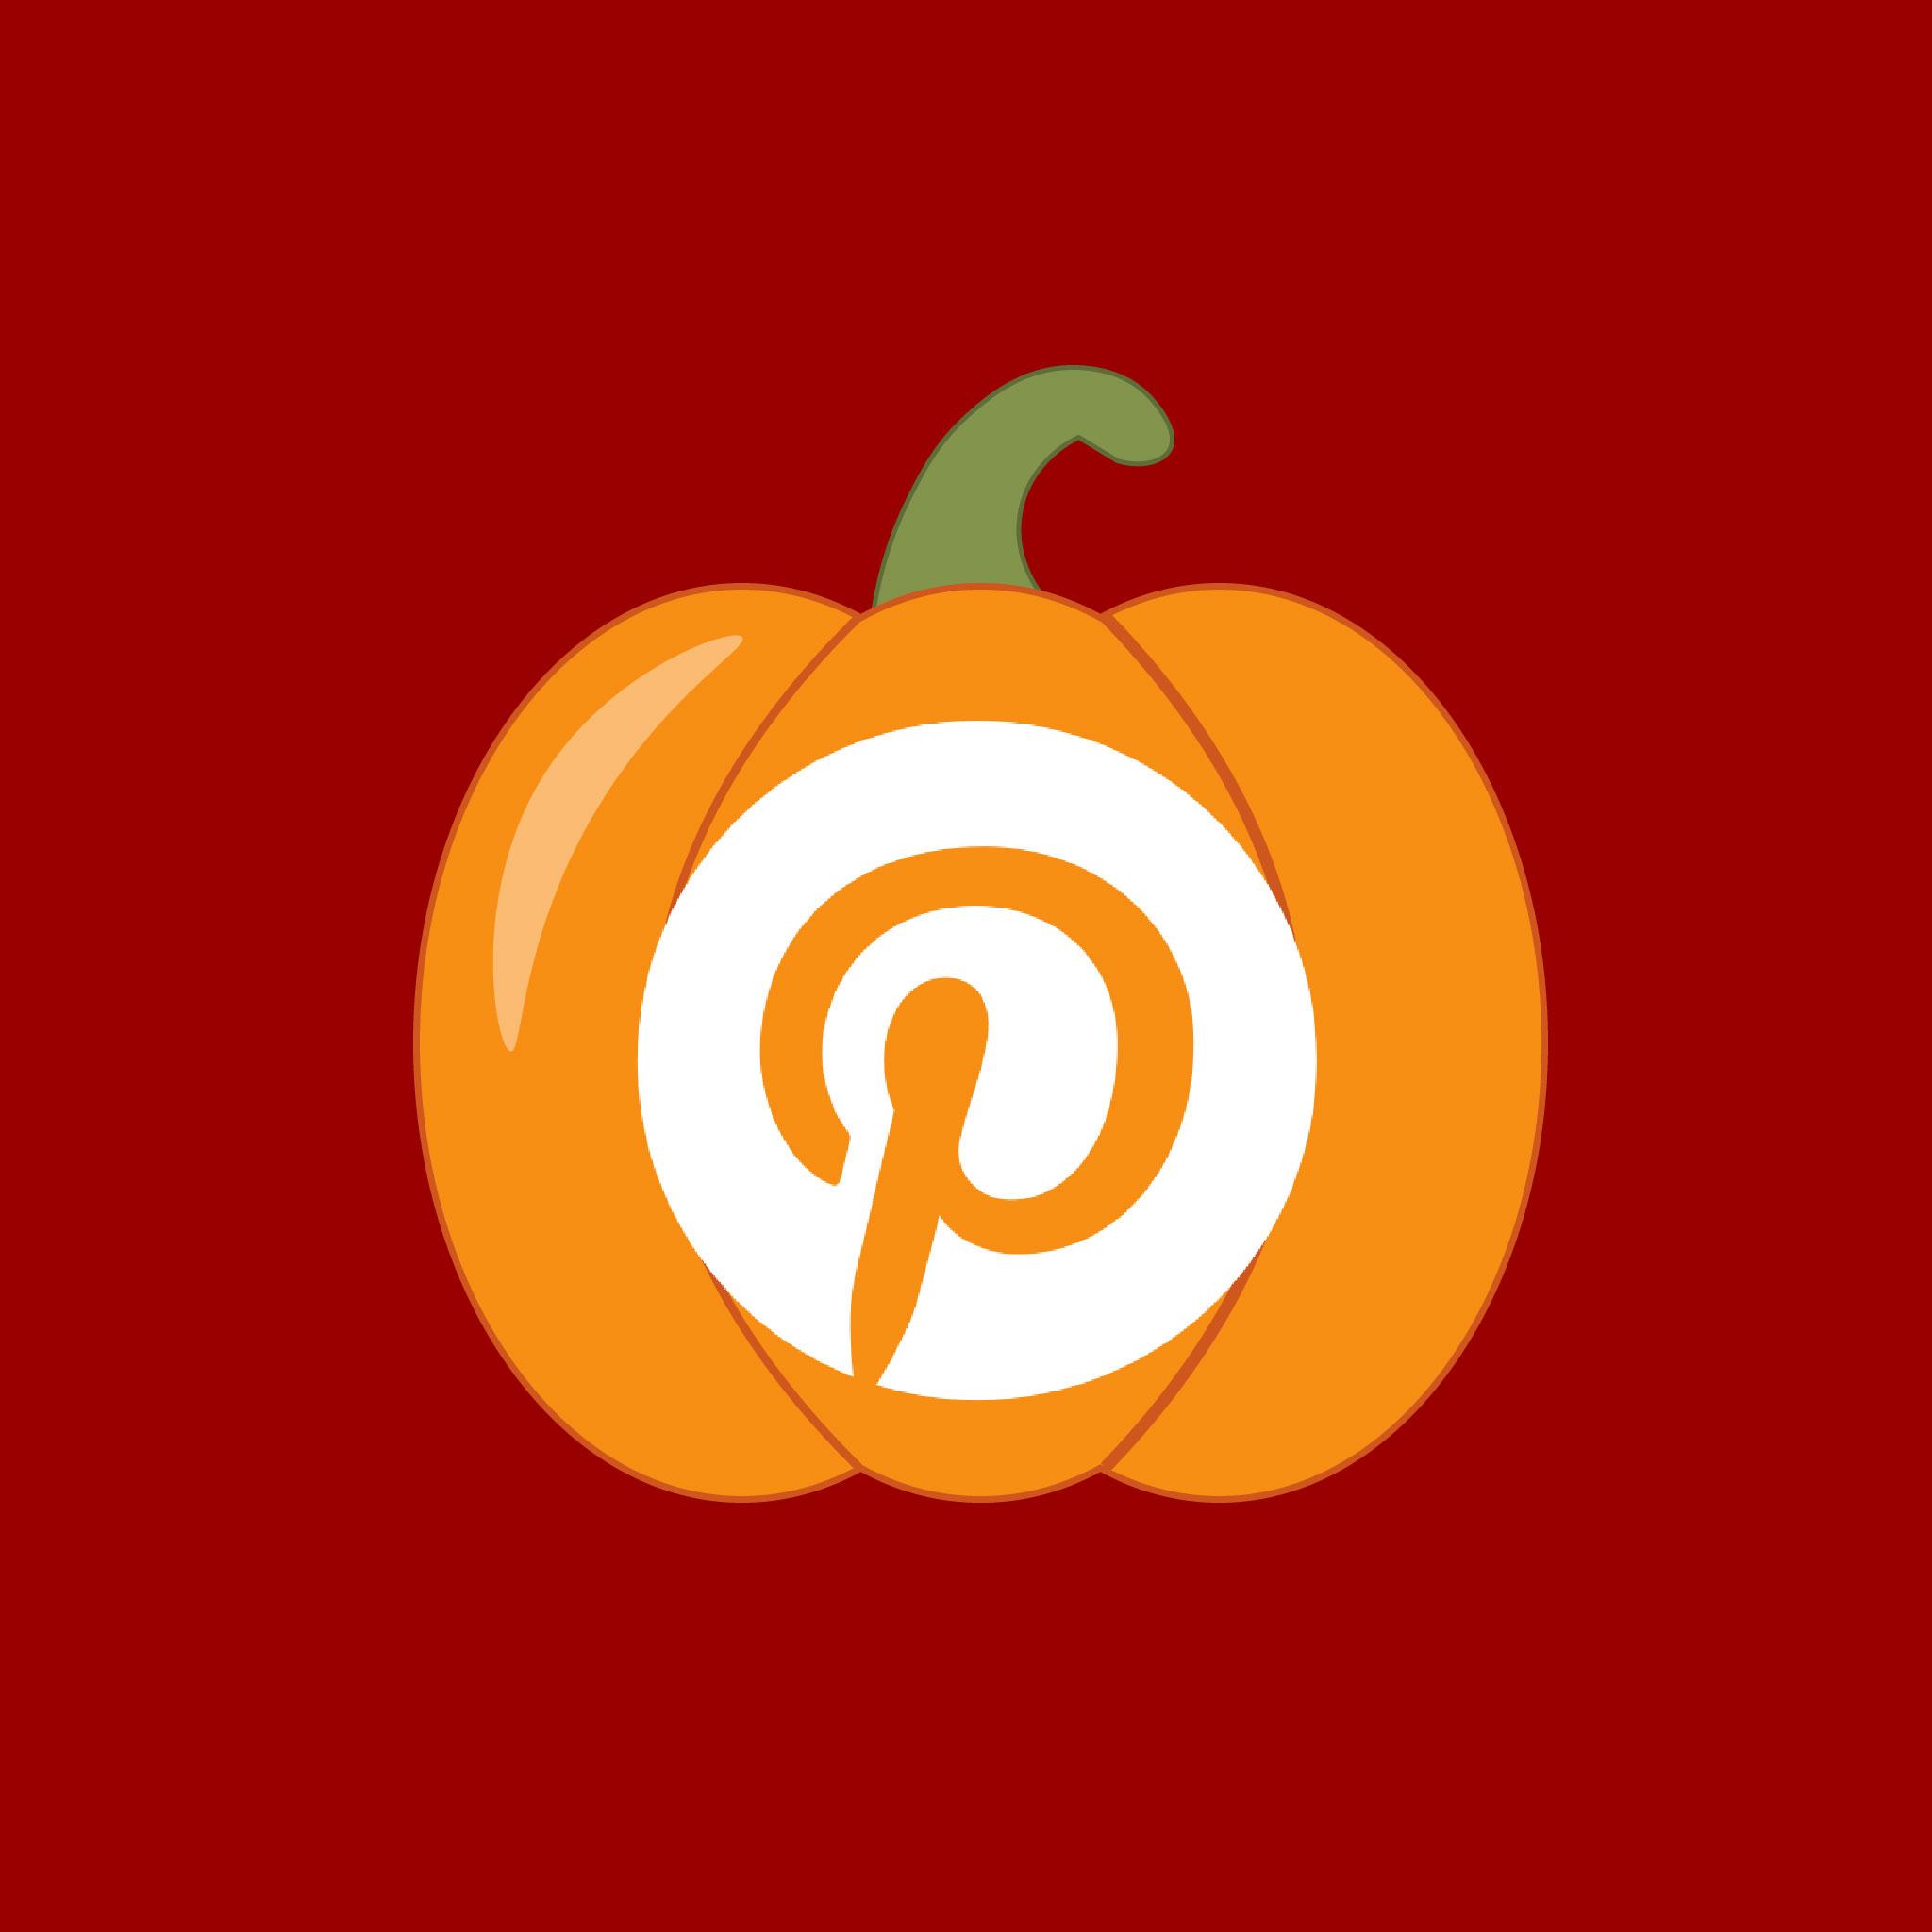 Pinterest Halloween App Icon from HalloweenCostumes.com